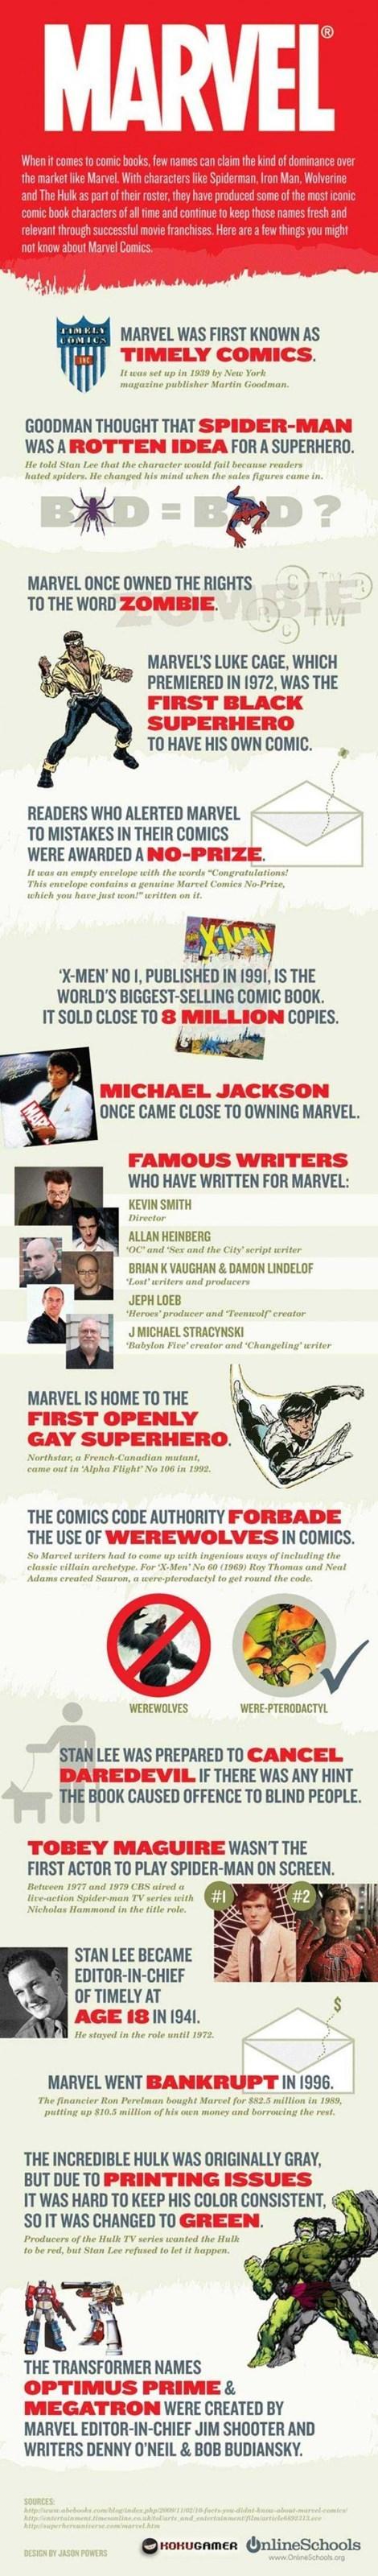 marvel,history,infographic